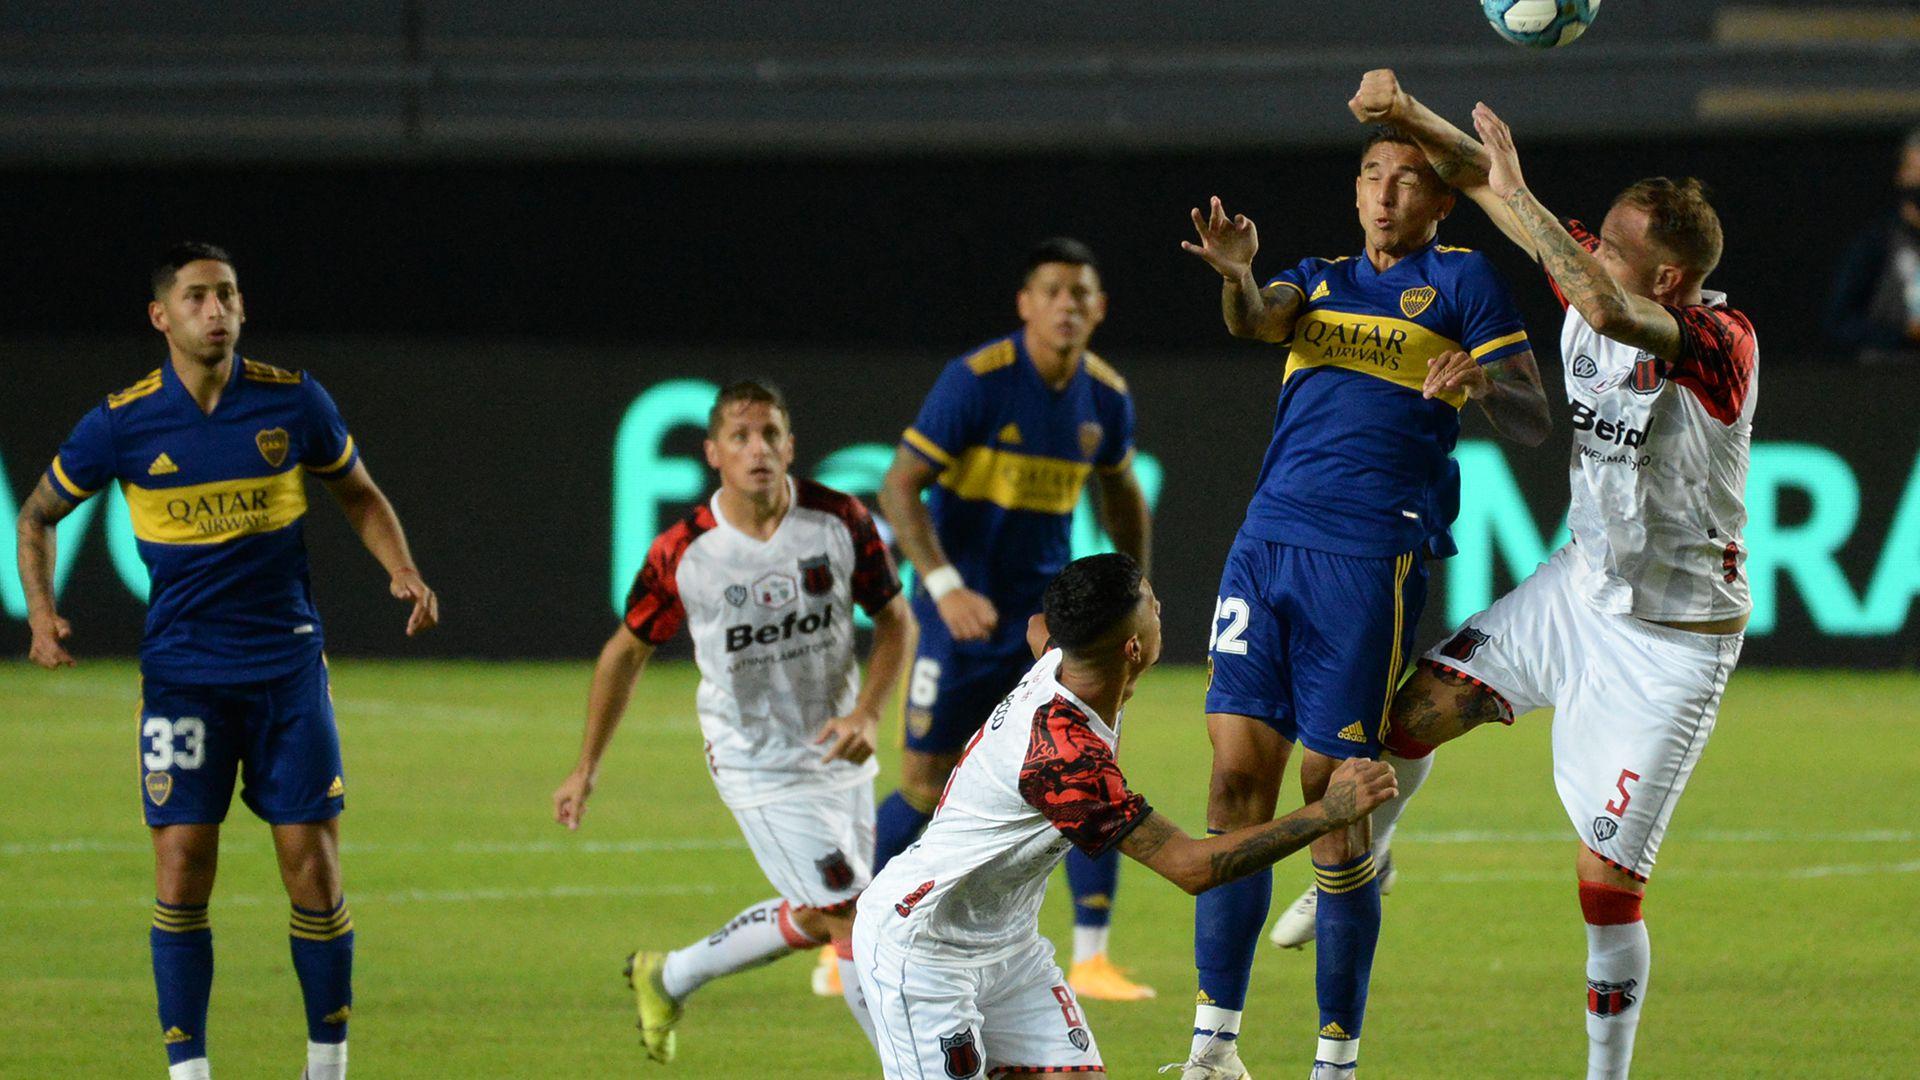 Boca vs Defensores de Belgrano